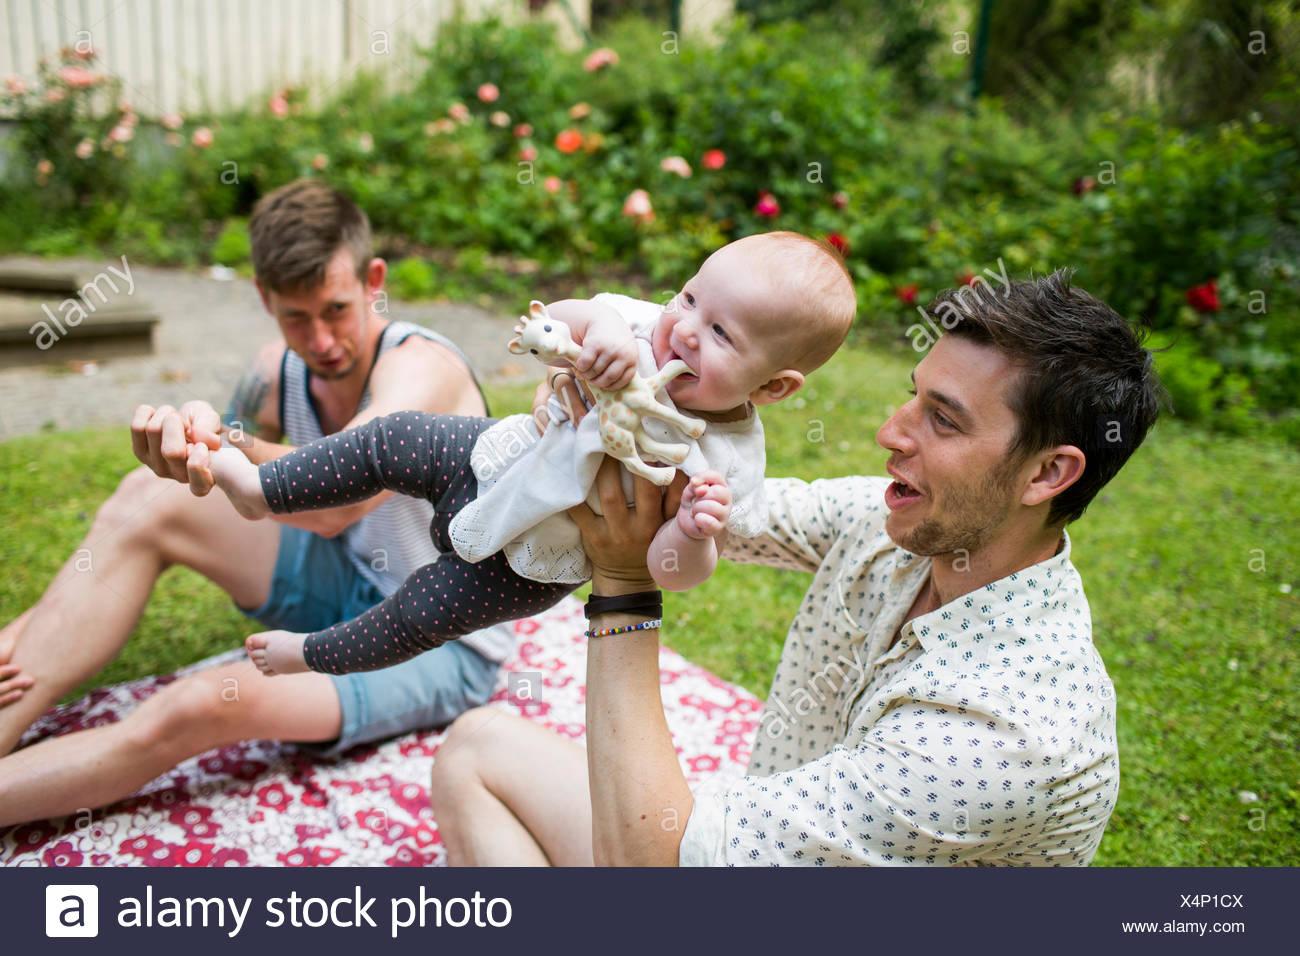 girls playing with men